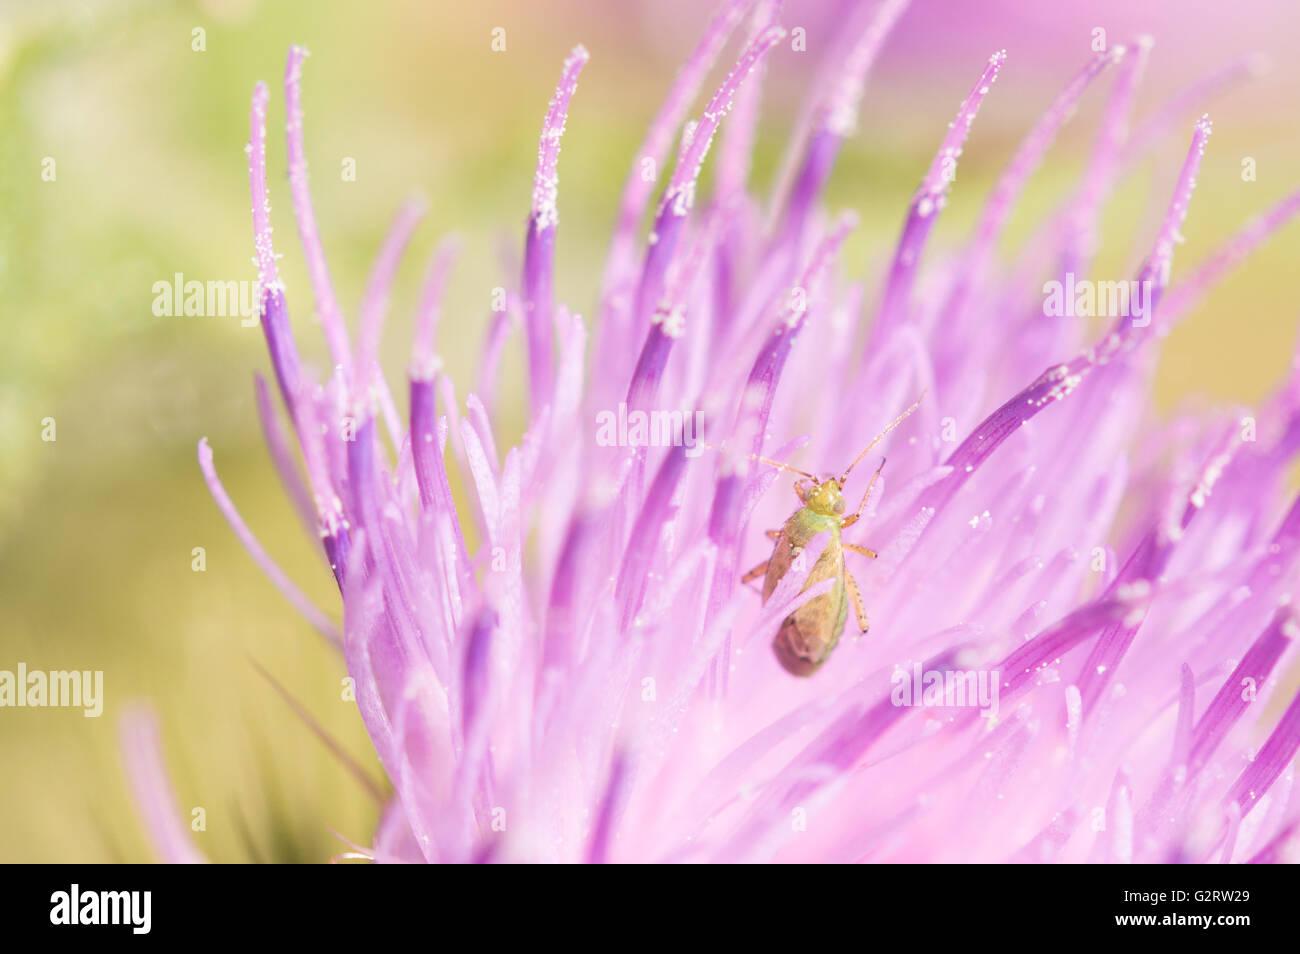 A Common Green Capsid bug (Lygocoris pabulinus) in a thistle flower. - Stock Image